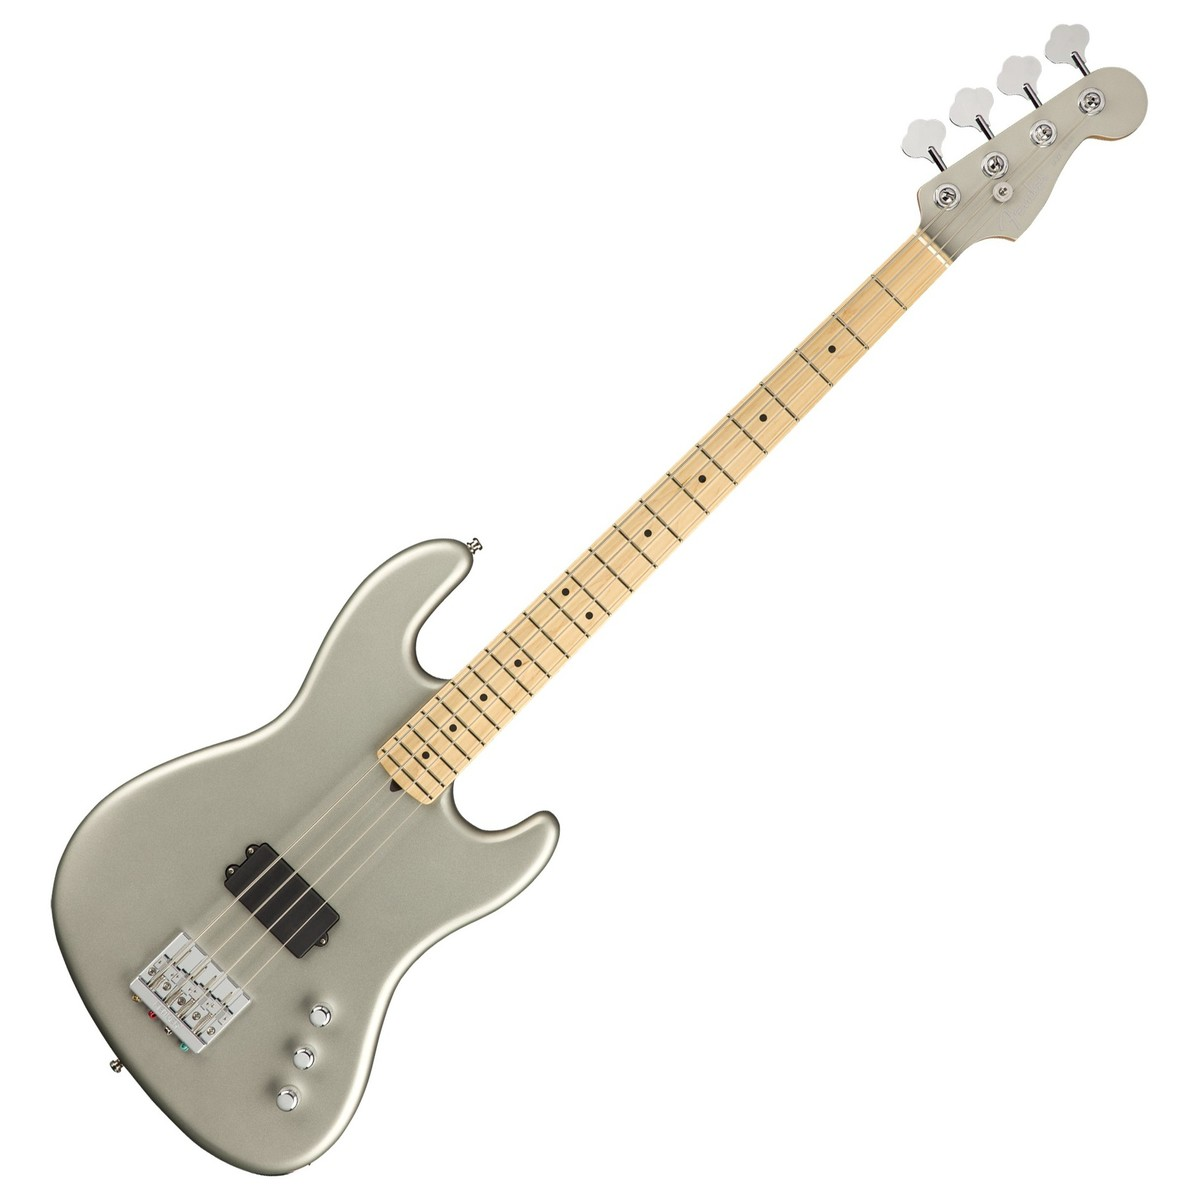 fender flea jazz bass active mn satin inca silver at gear4music. Black Bedroom Furniture Sets. Home Design Ideas